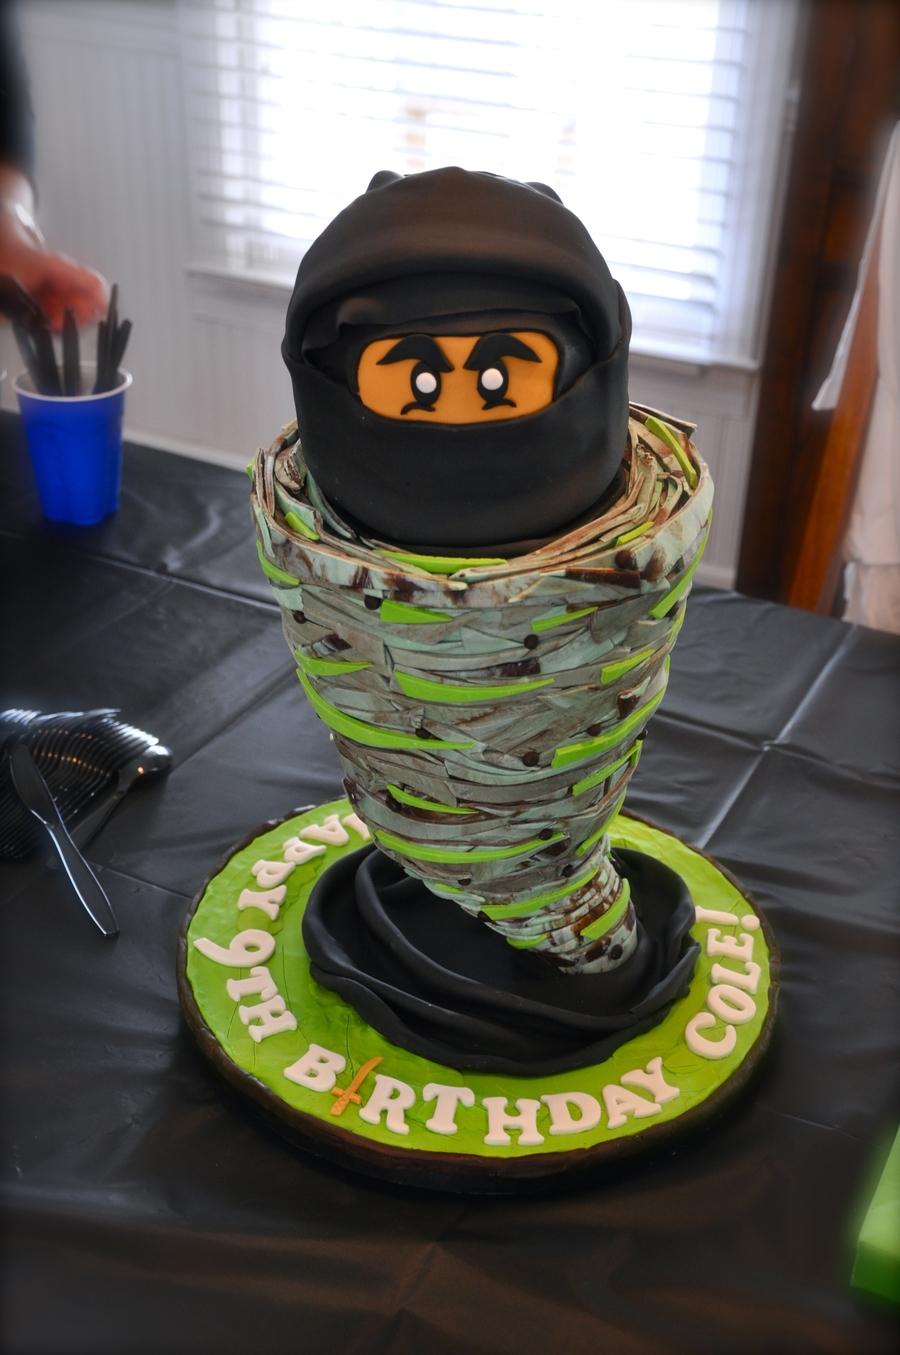 Pleasing Lego Ninjago Birthday Cake Cakecentral Com Funny Birthday Cards Online Inifofree Goldxyz